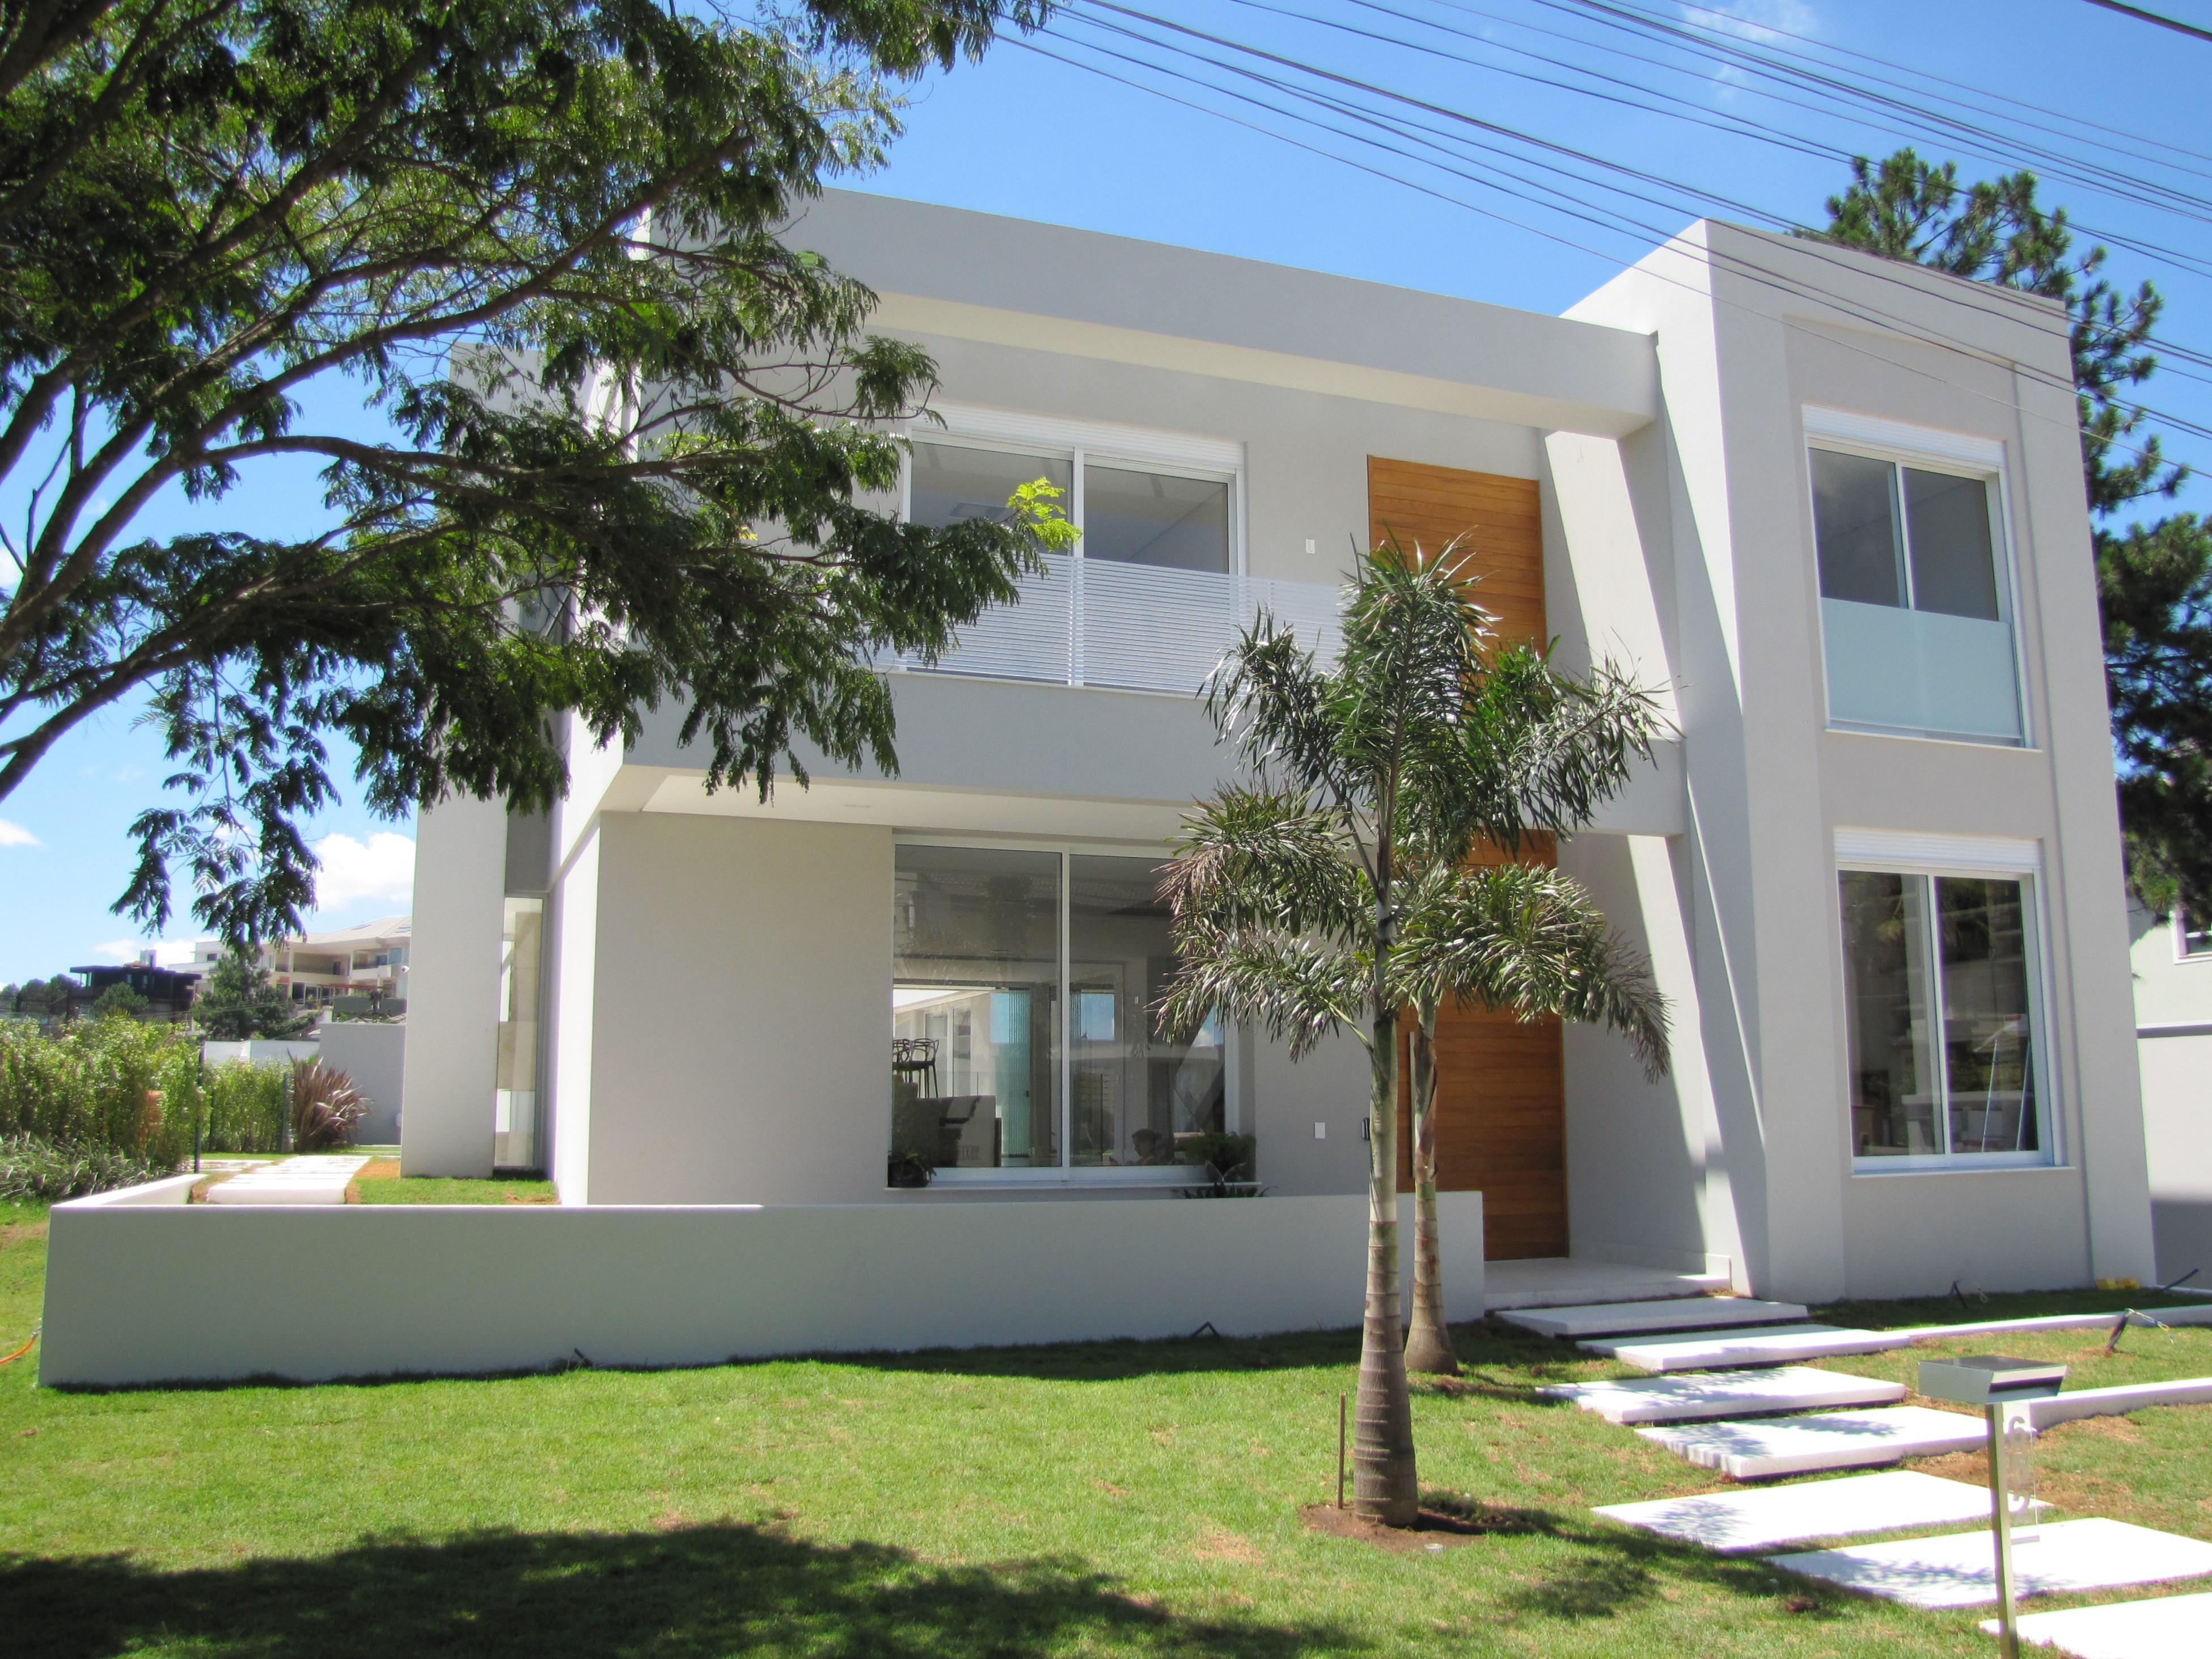 Casa Al. Antilhas